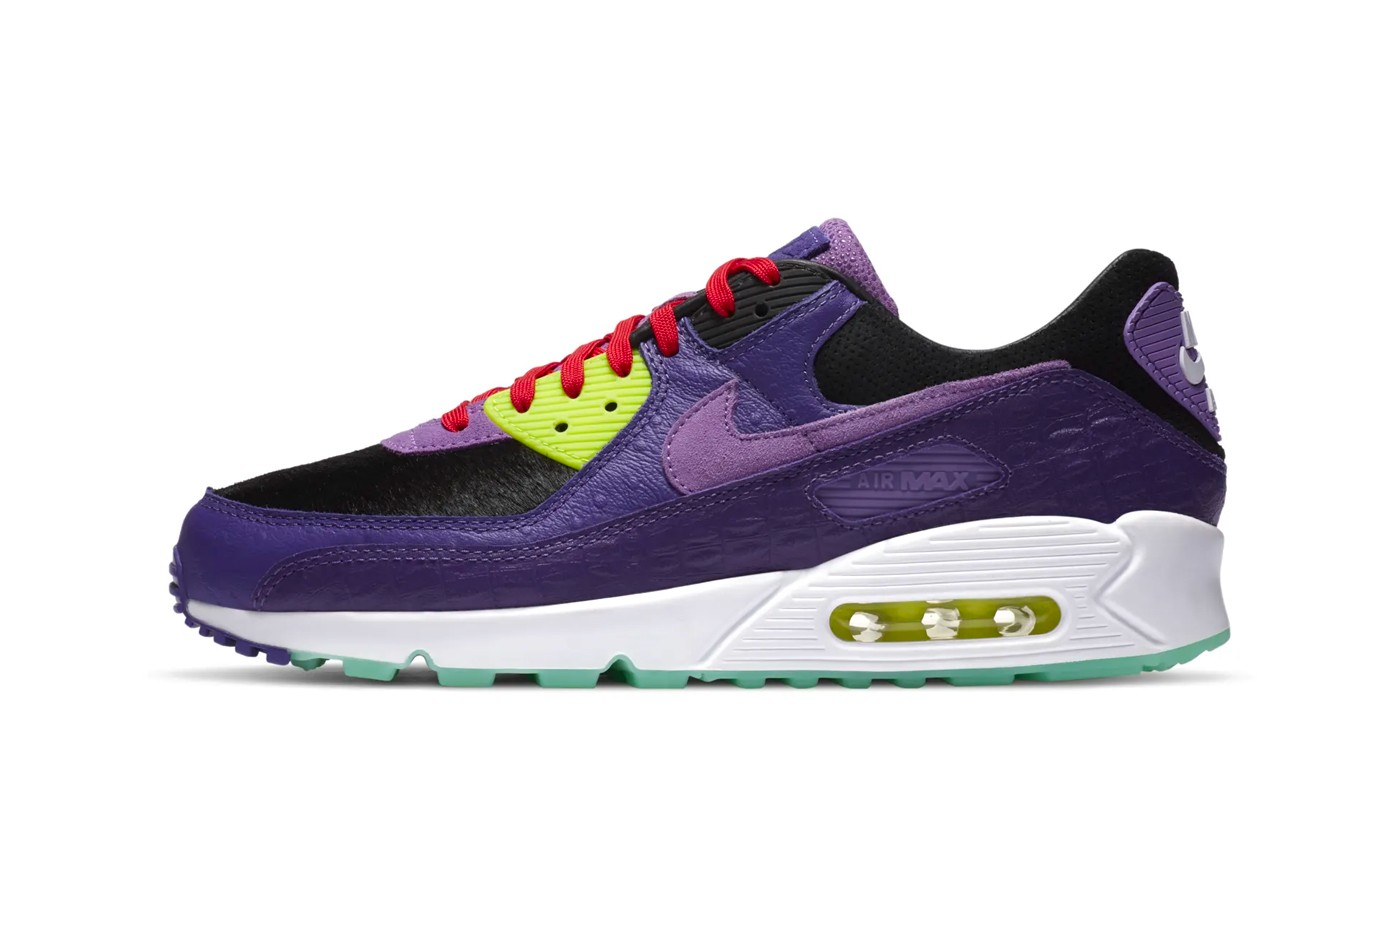 nike air max 90 purple and teal